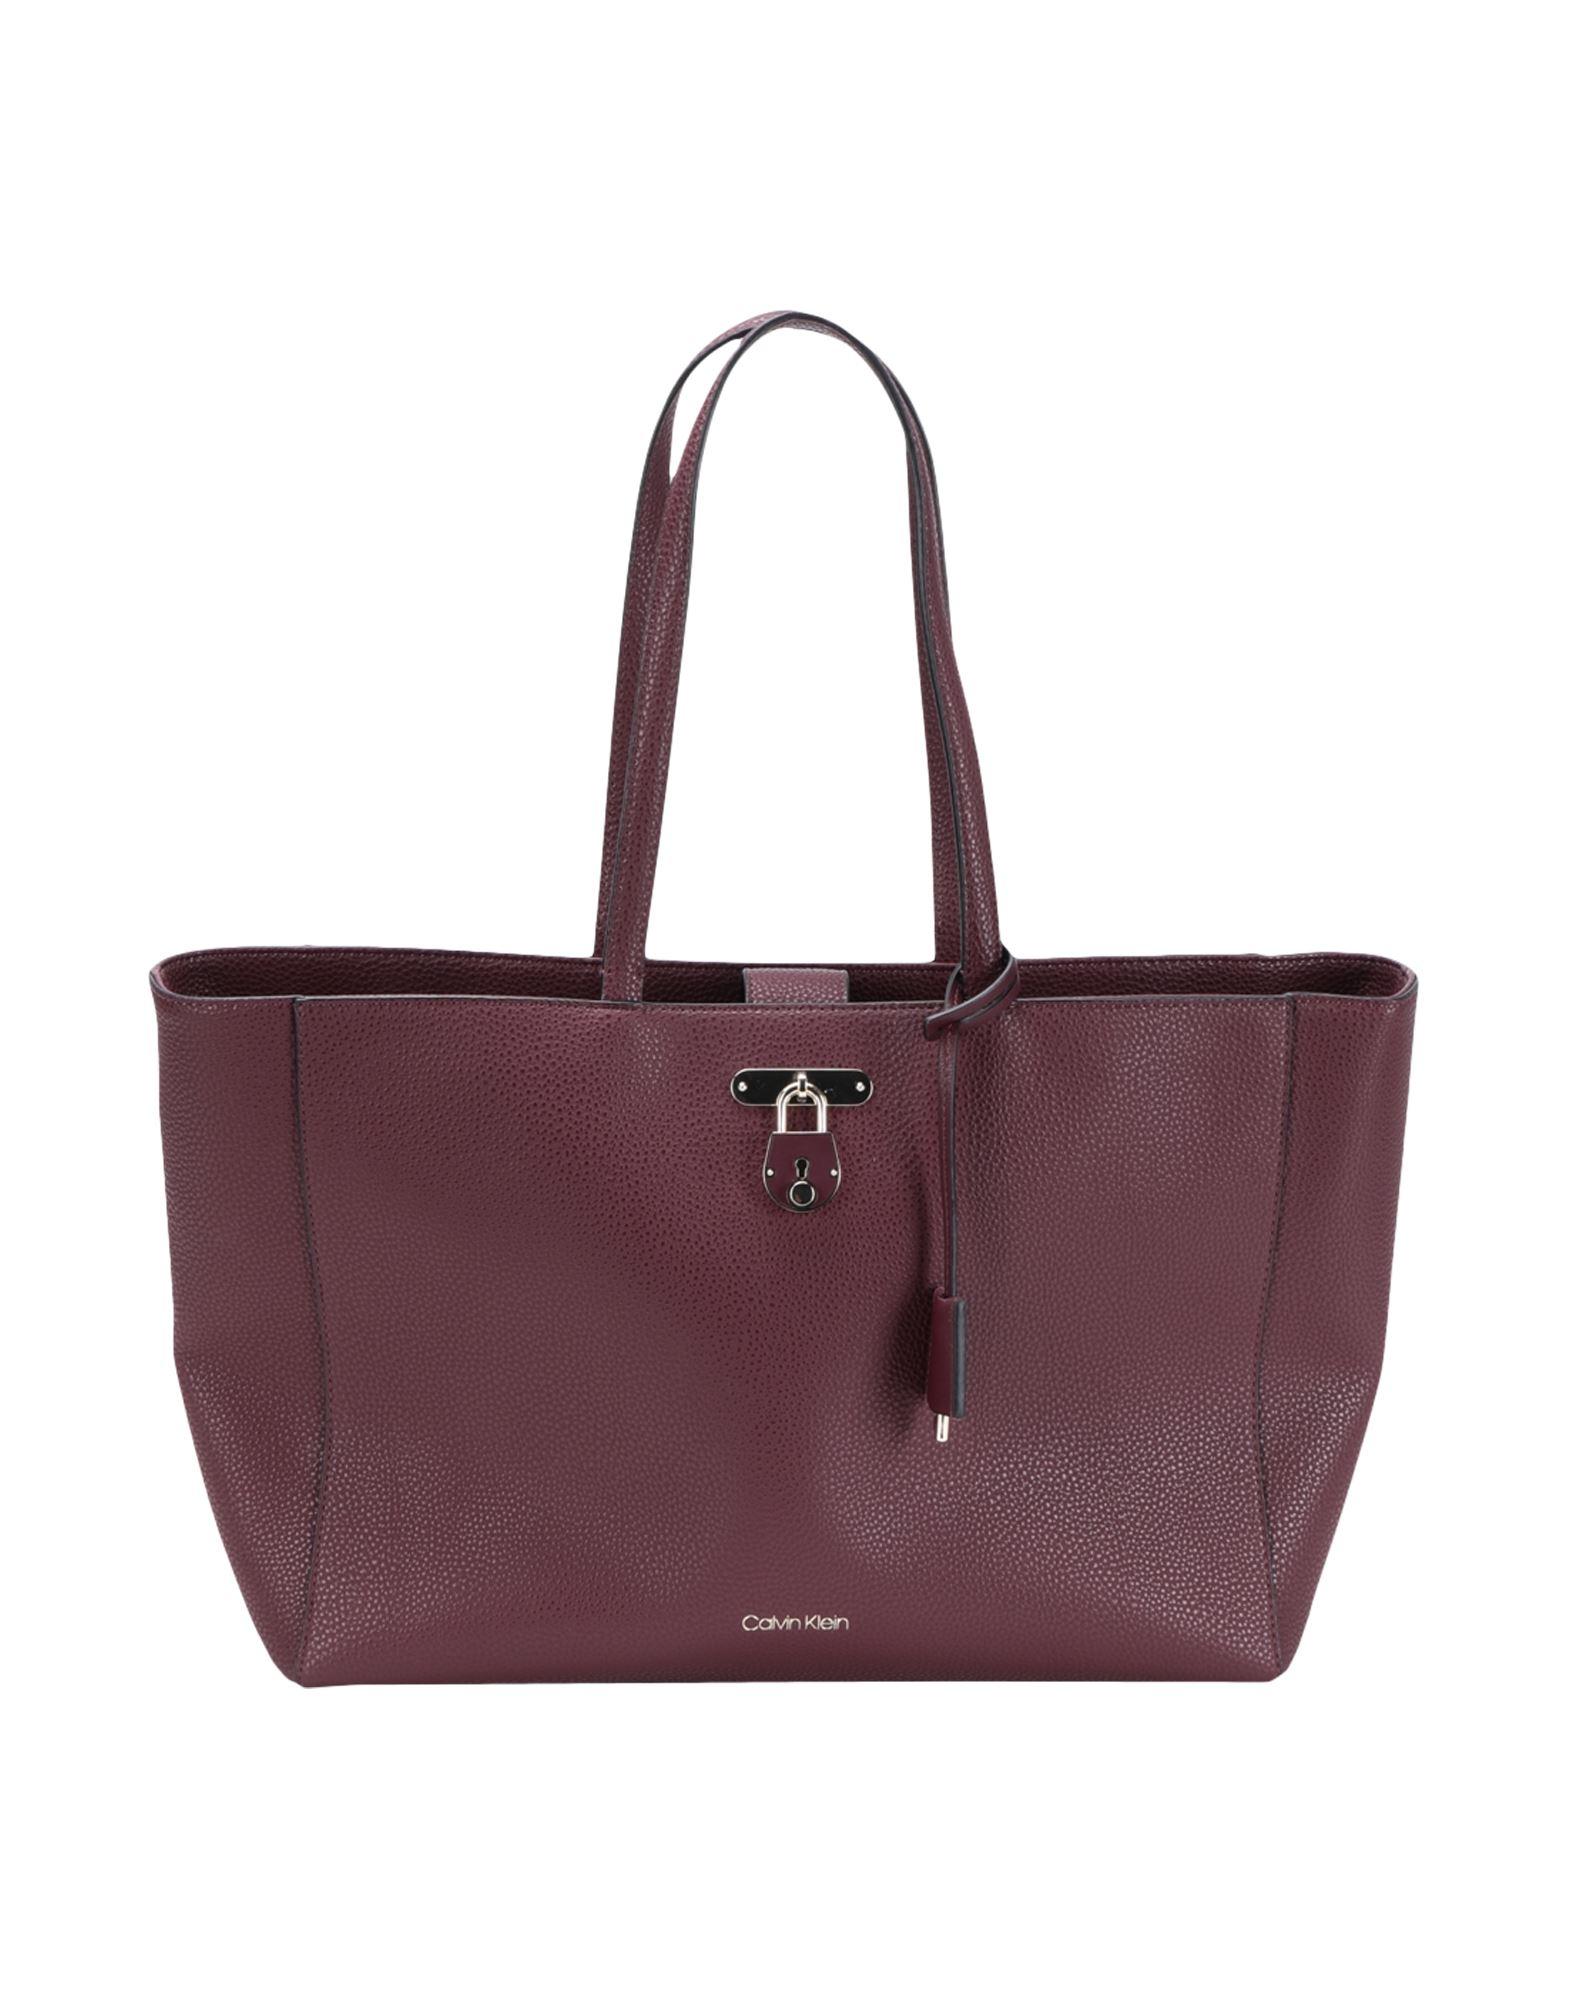 CALVIN KLEIN Handbags - Item 45561498